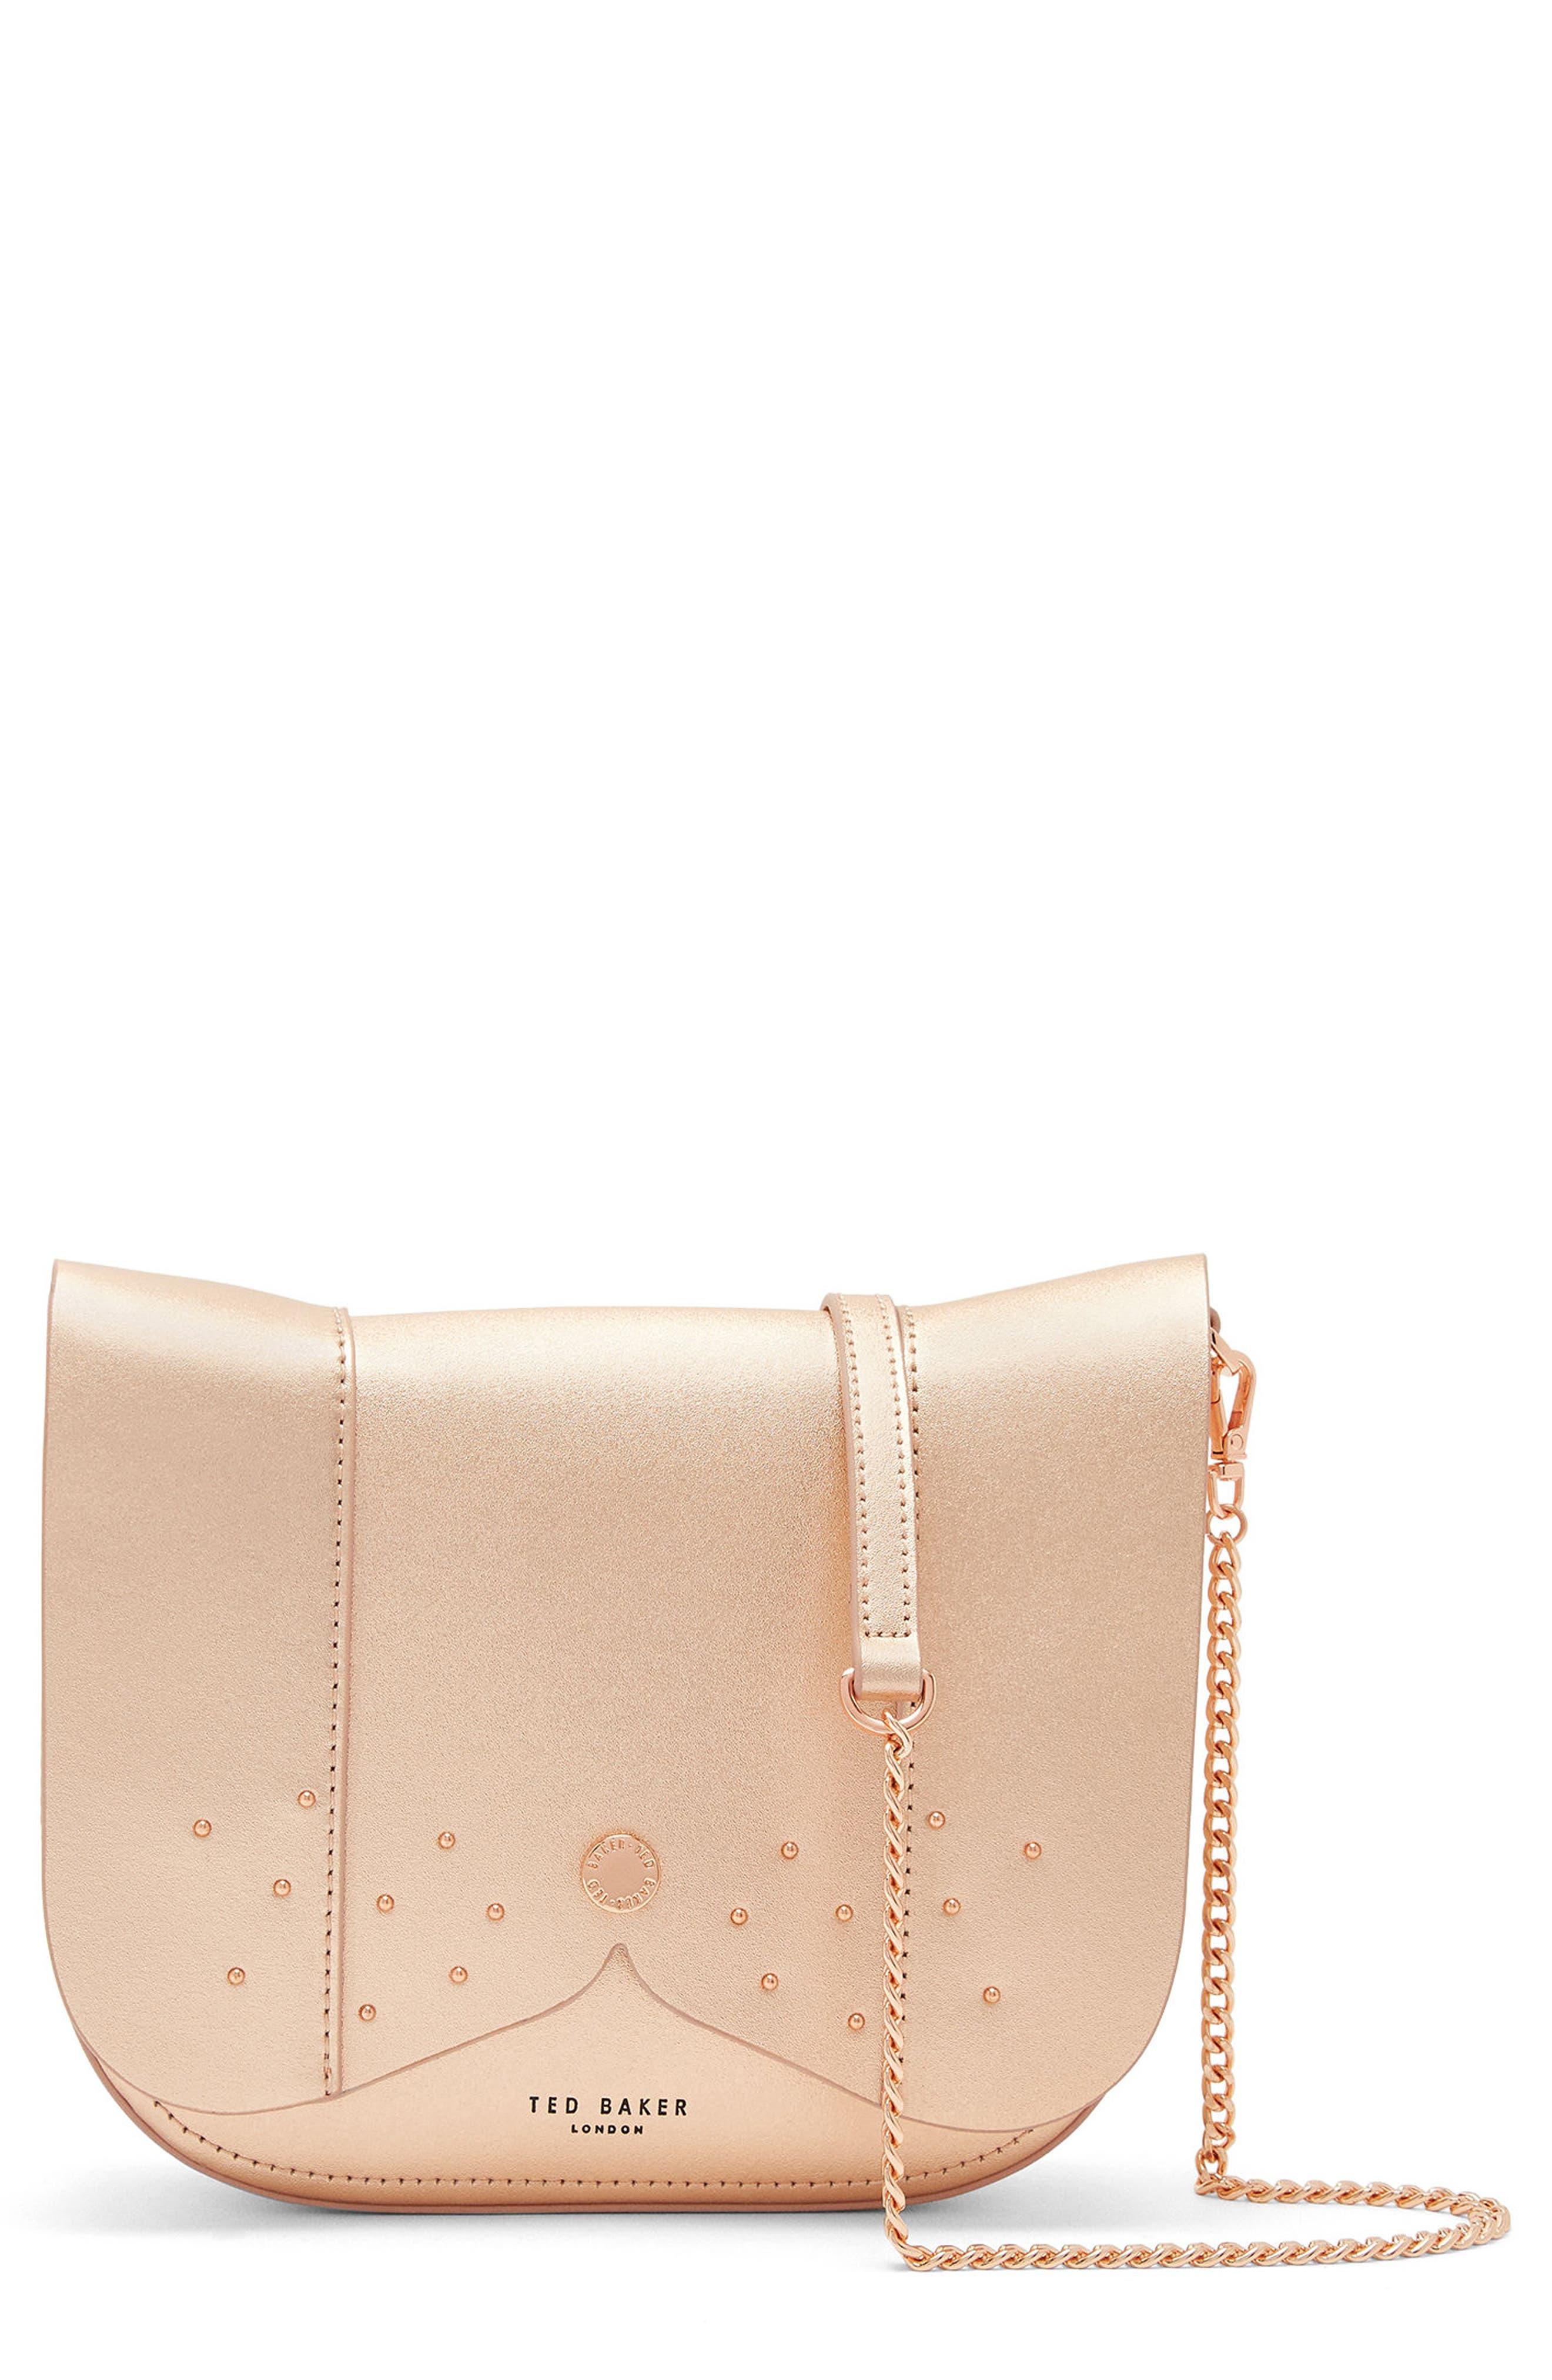 Barkley Dog Leather Crossbody Bag,                             Main thumbnail 1, color,                             Rose Gold